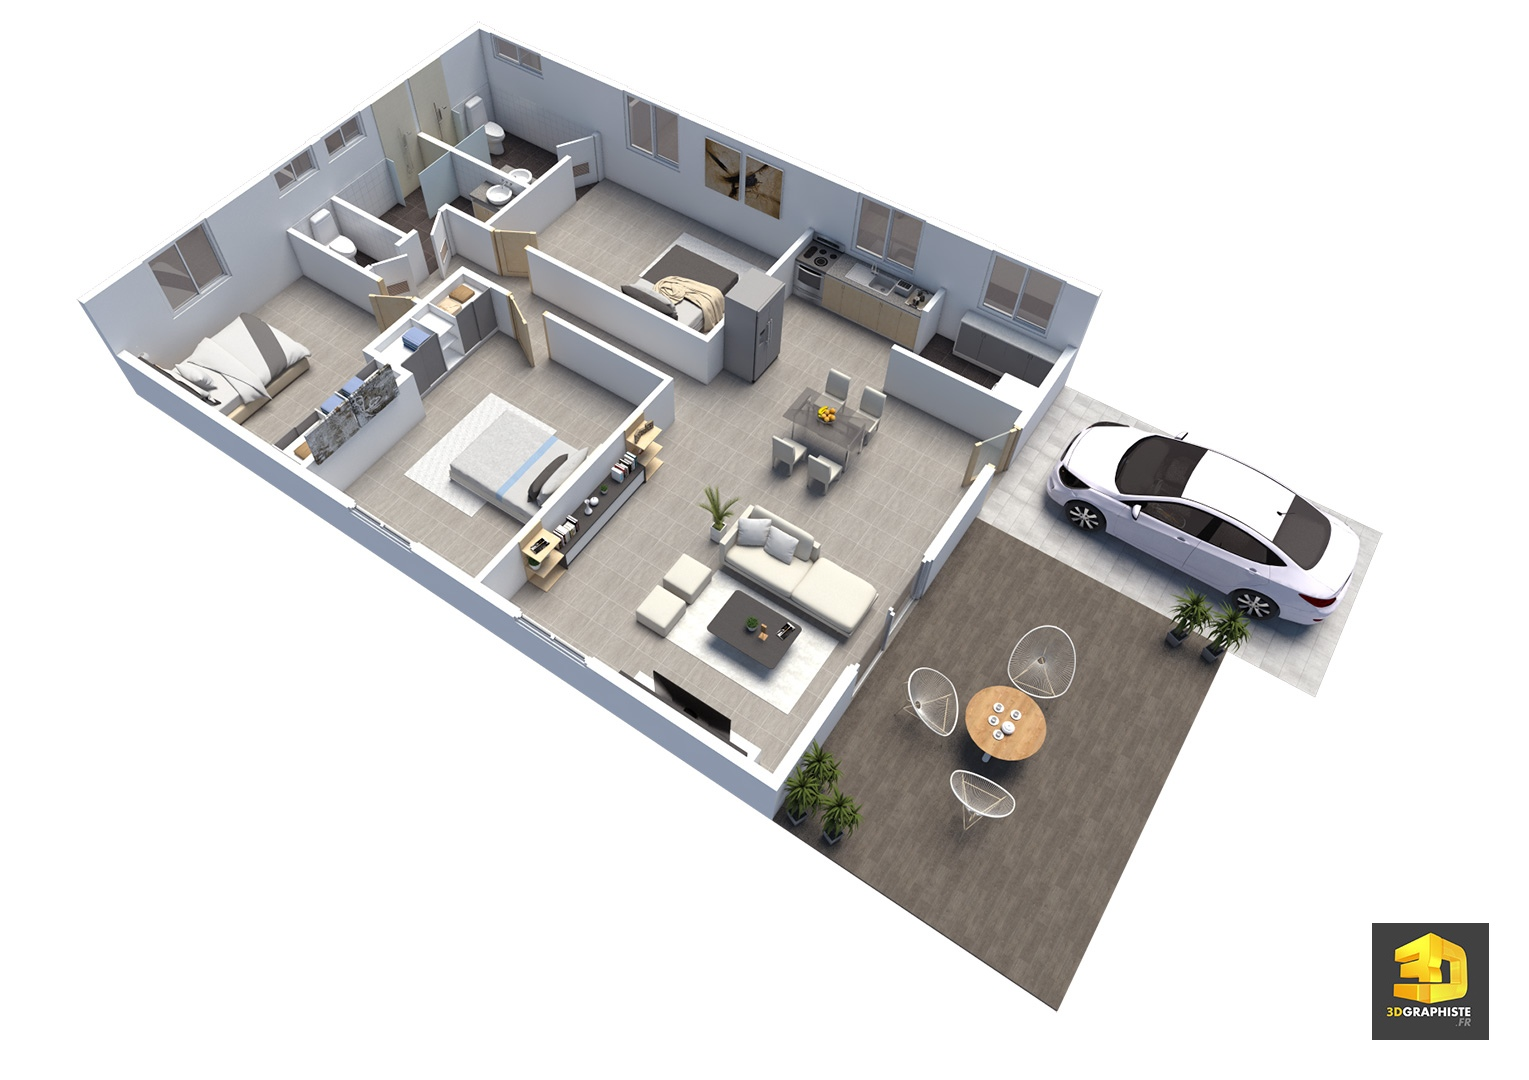 plans de vente de maisons r sidence les jardins d 39 ang lina 3dgraphiste fr. Black Bedroom Furniture Sets. Home Design Ideas